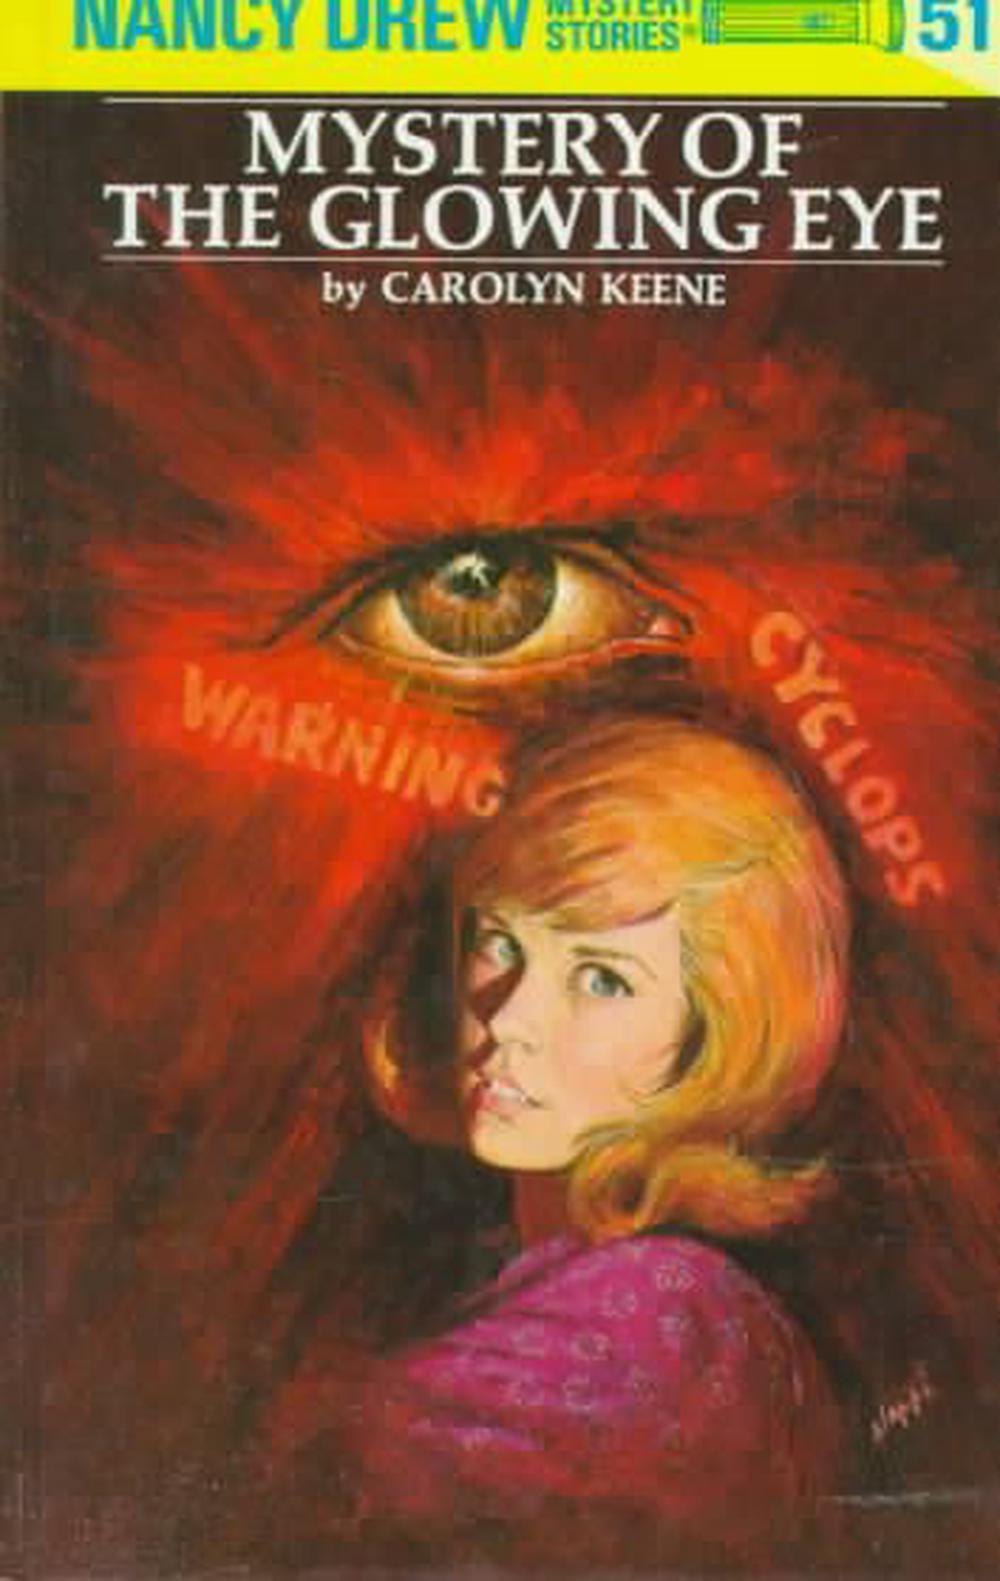 Mystery of the Glowing Eye (Nancy Drew Mystery Stories, #51)